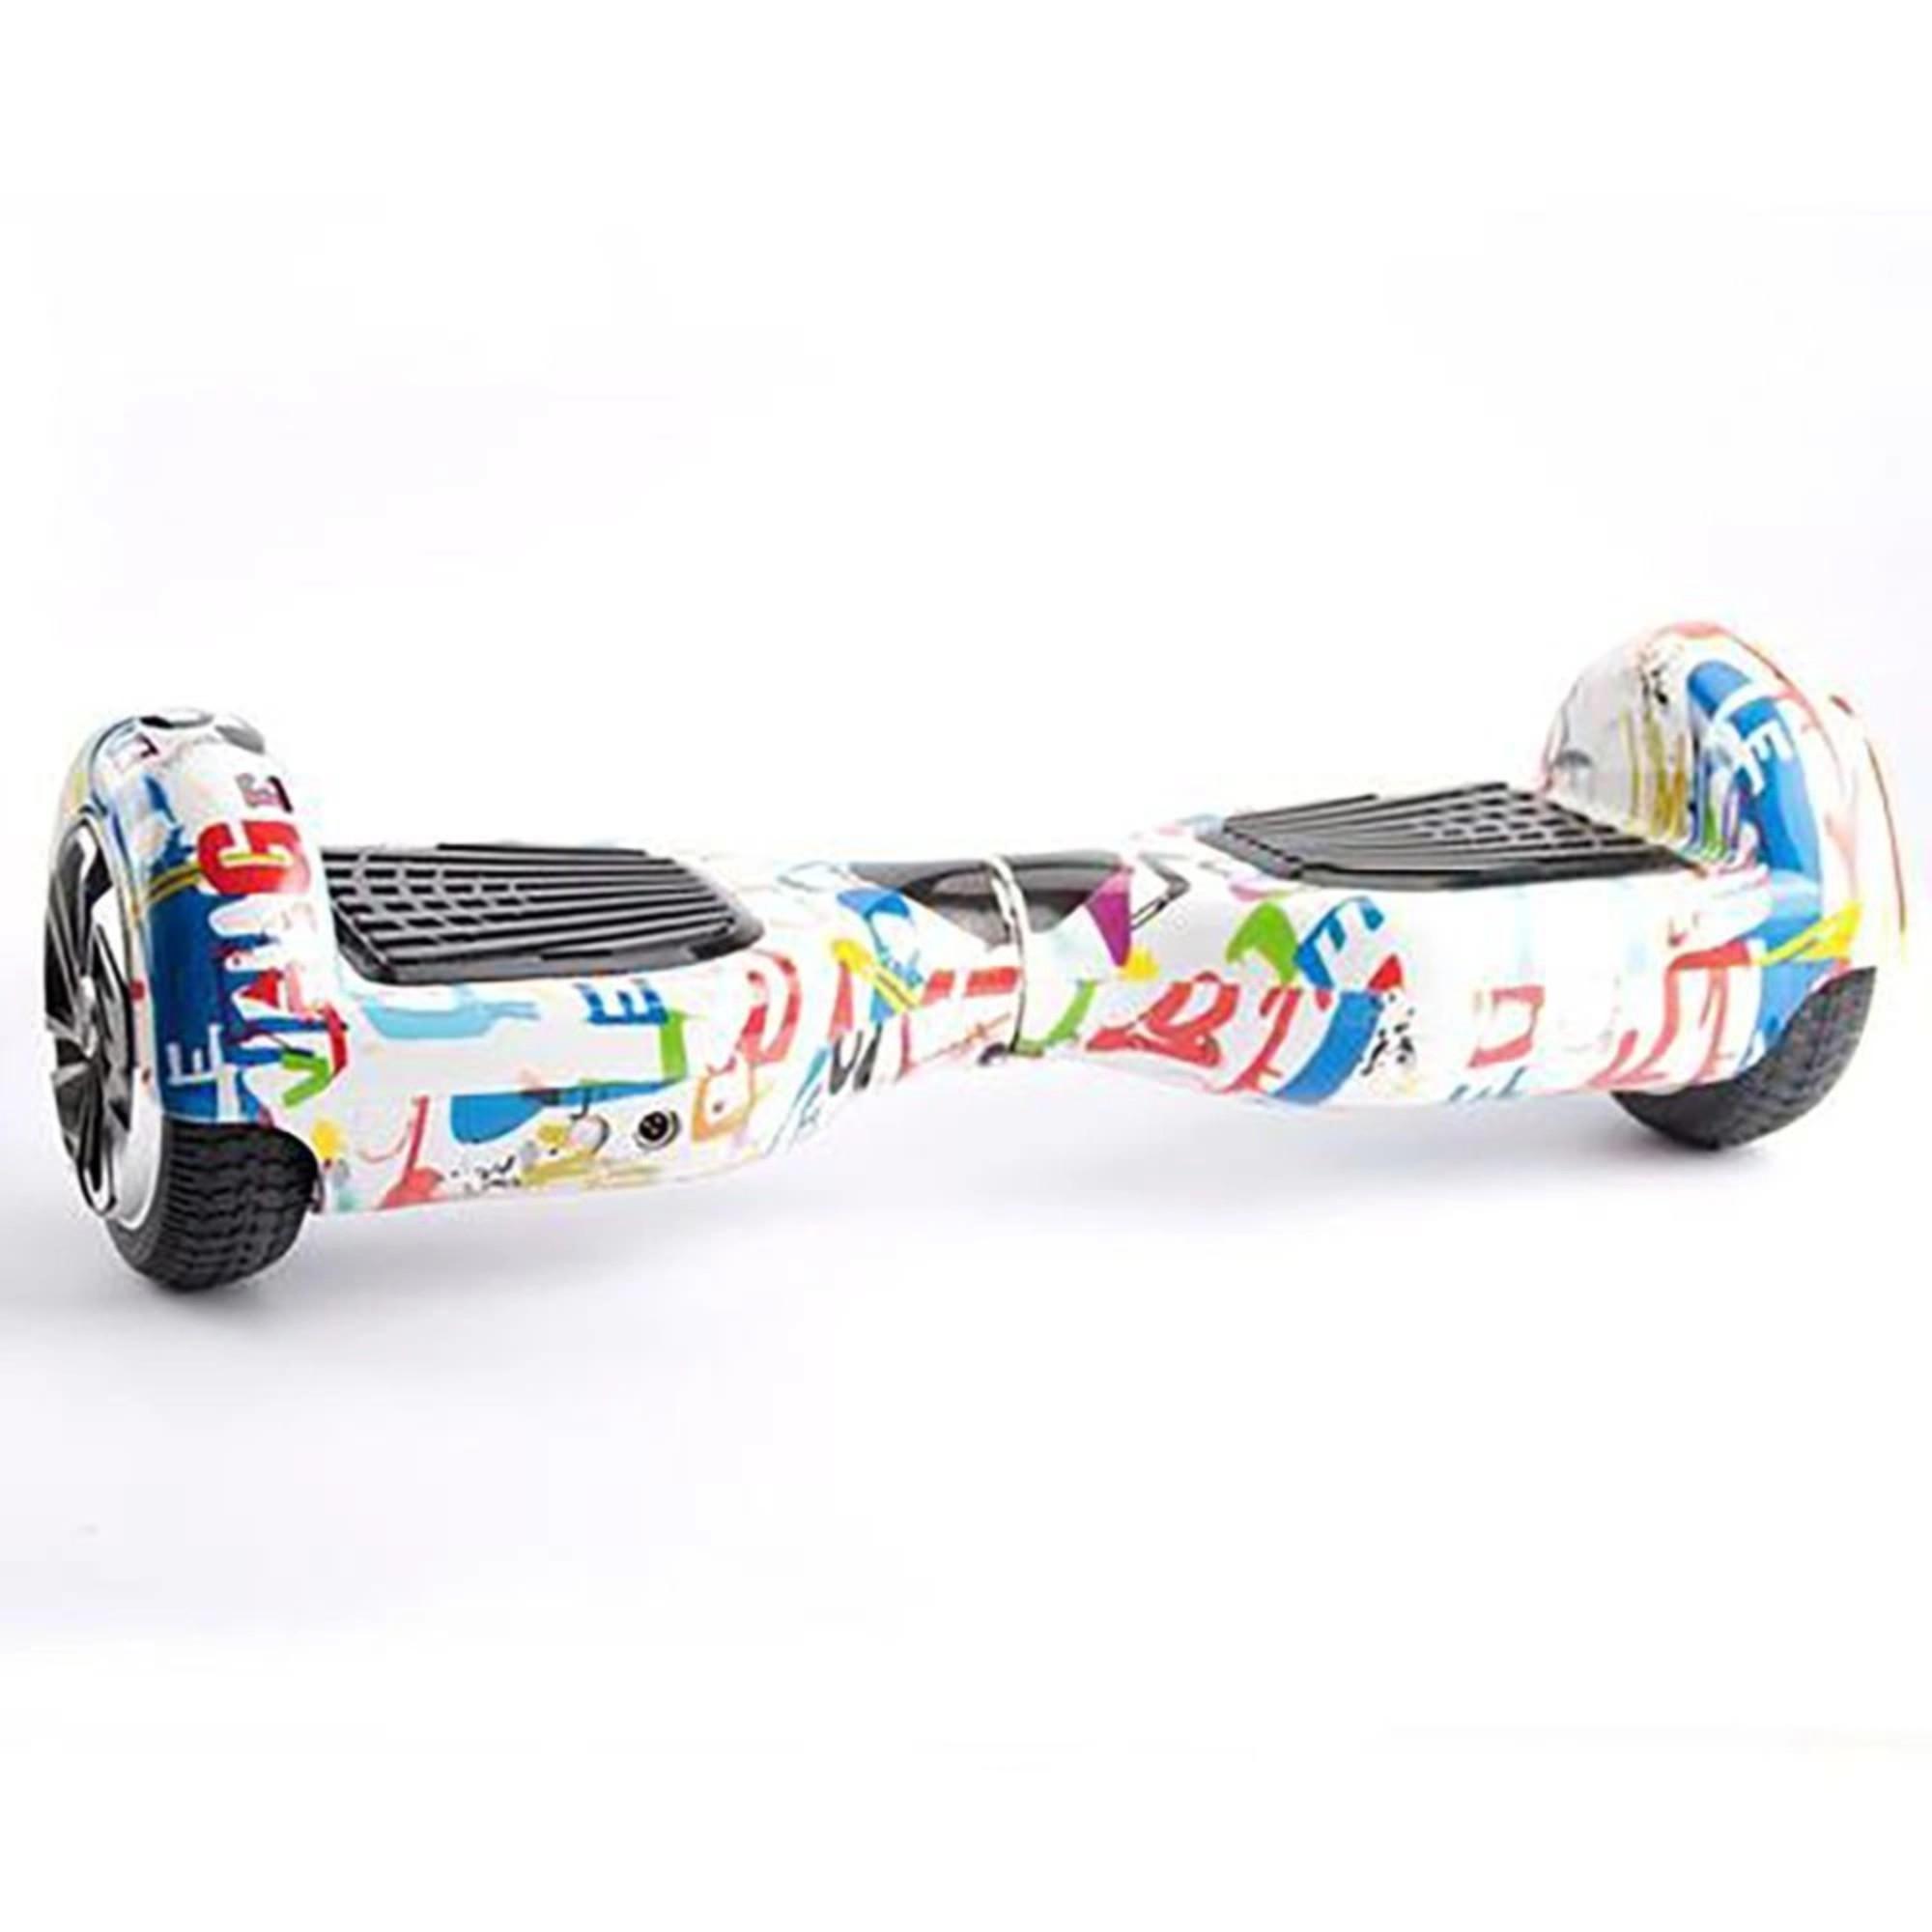 Skate Elétrico Overboard 6,5' Poleg. Smart Balance Com Alça